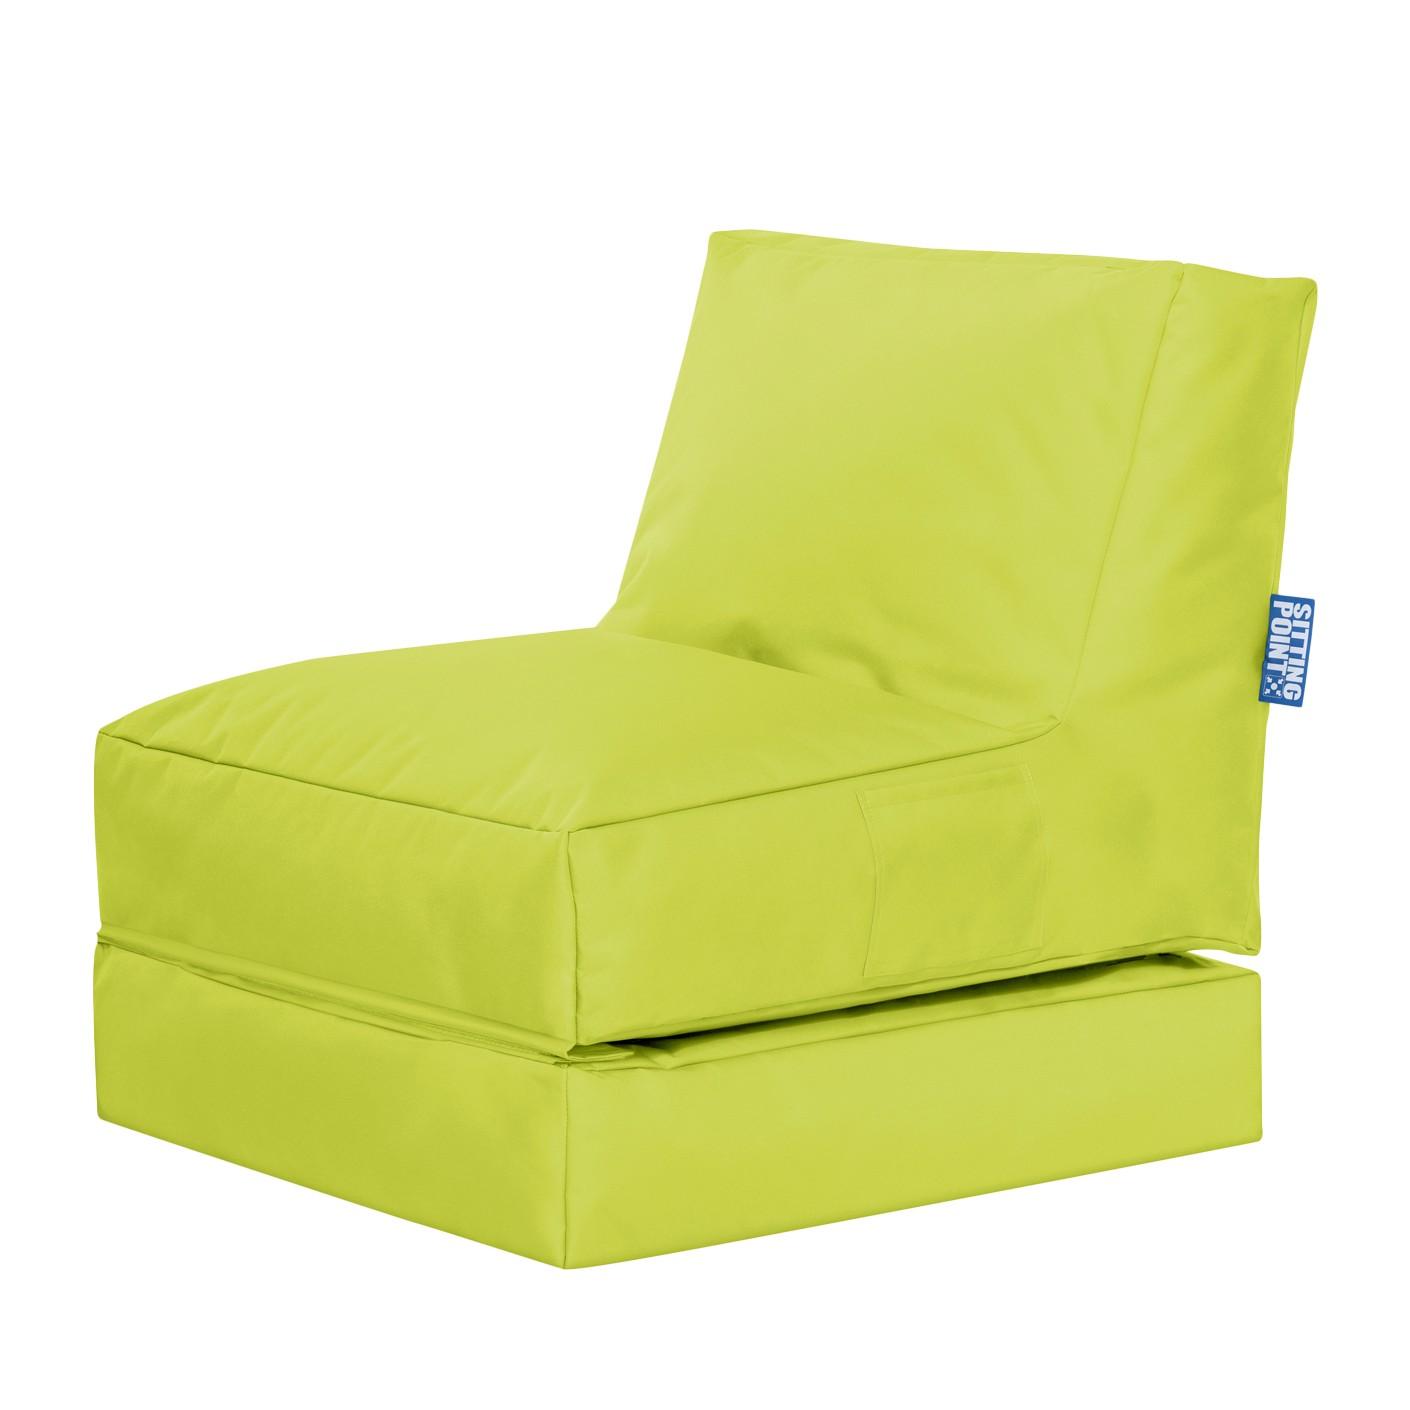 Sitzsack Twist Scuba   Flachgewebe   Limengrün, SITTING POINT